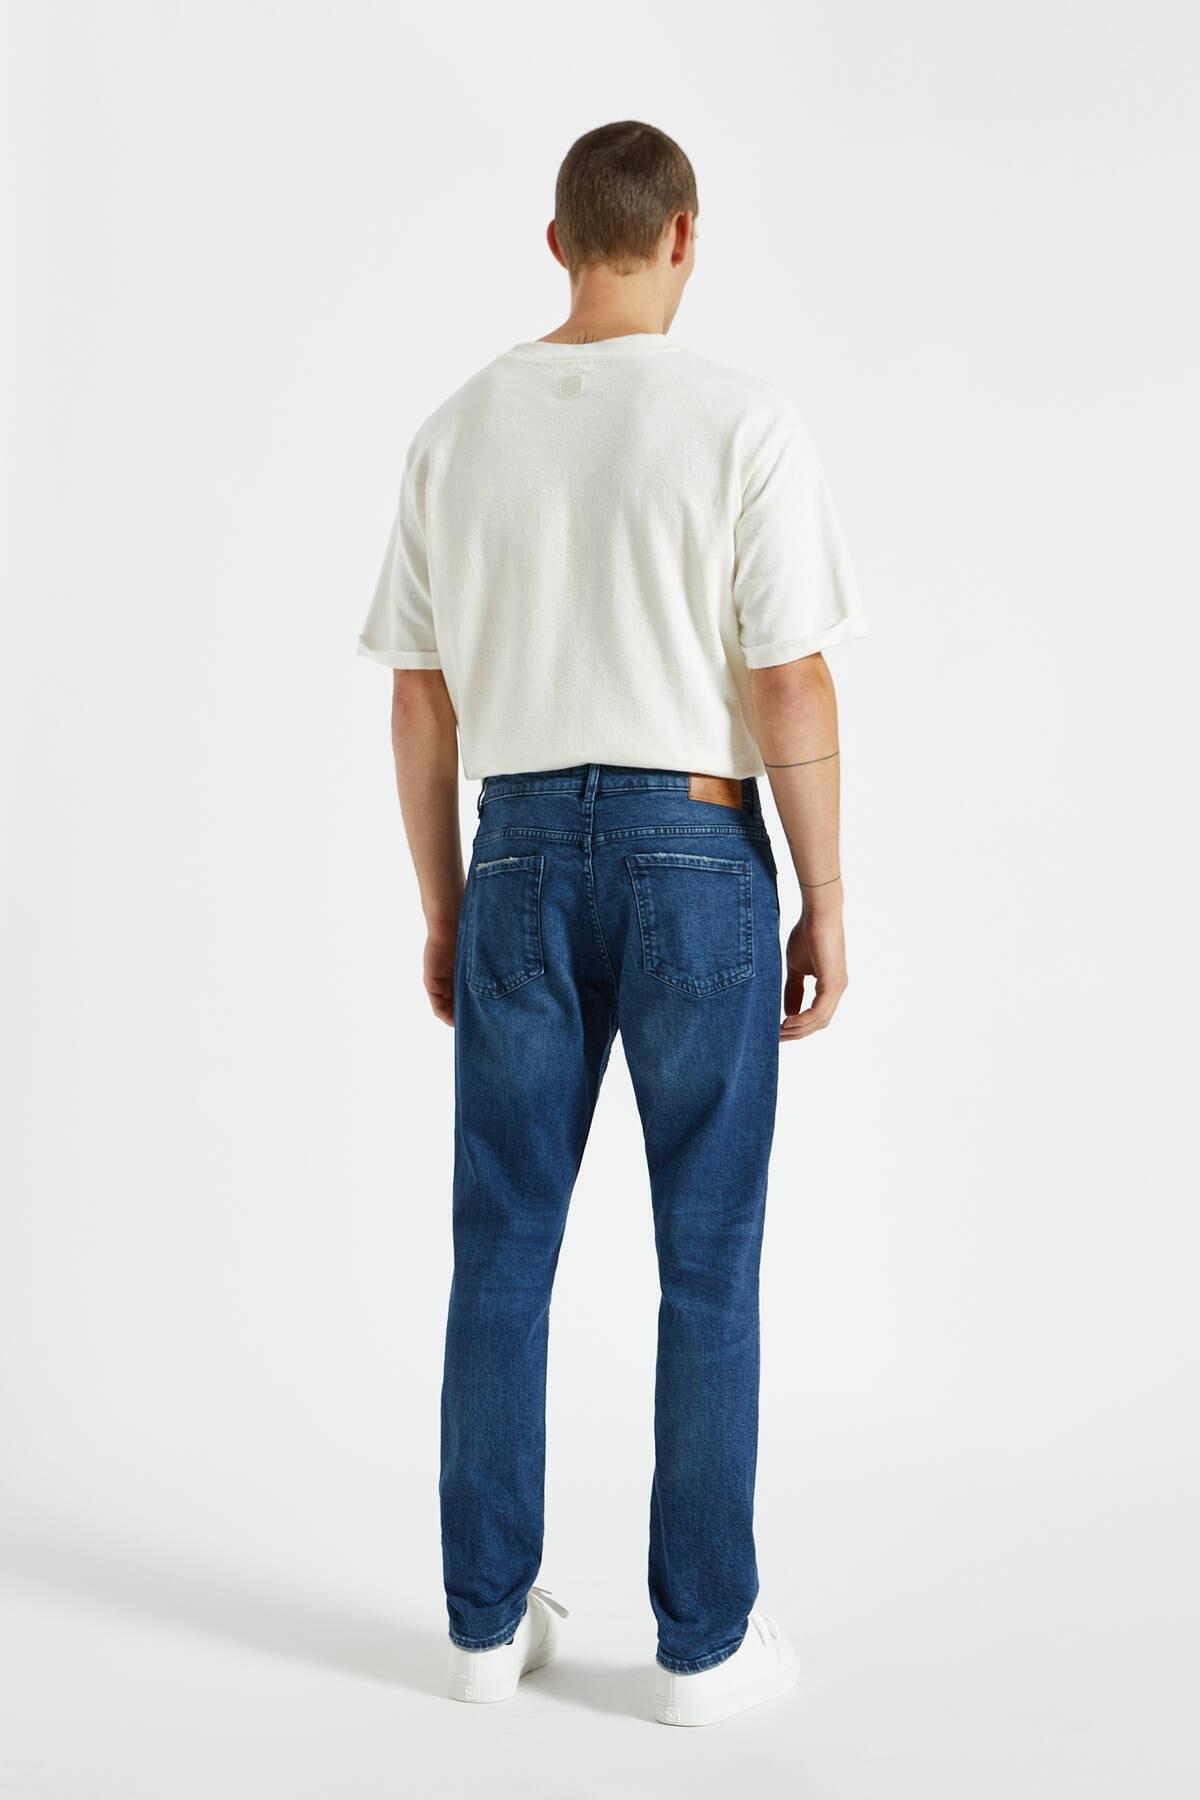 Pull & Bear Erkek Koyu Mavi Comfort Slim Fit Jean 09683530 3